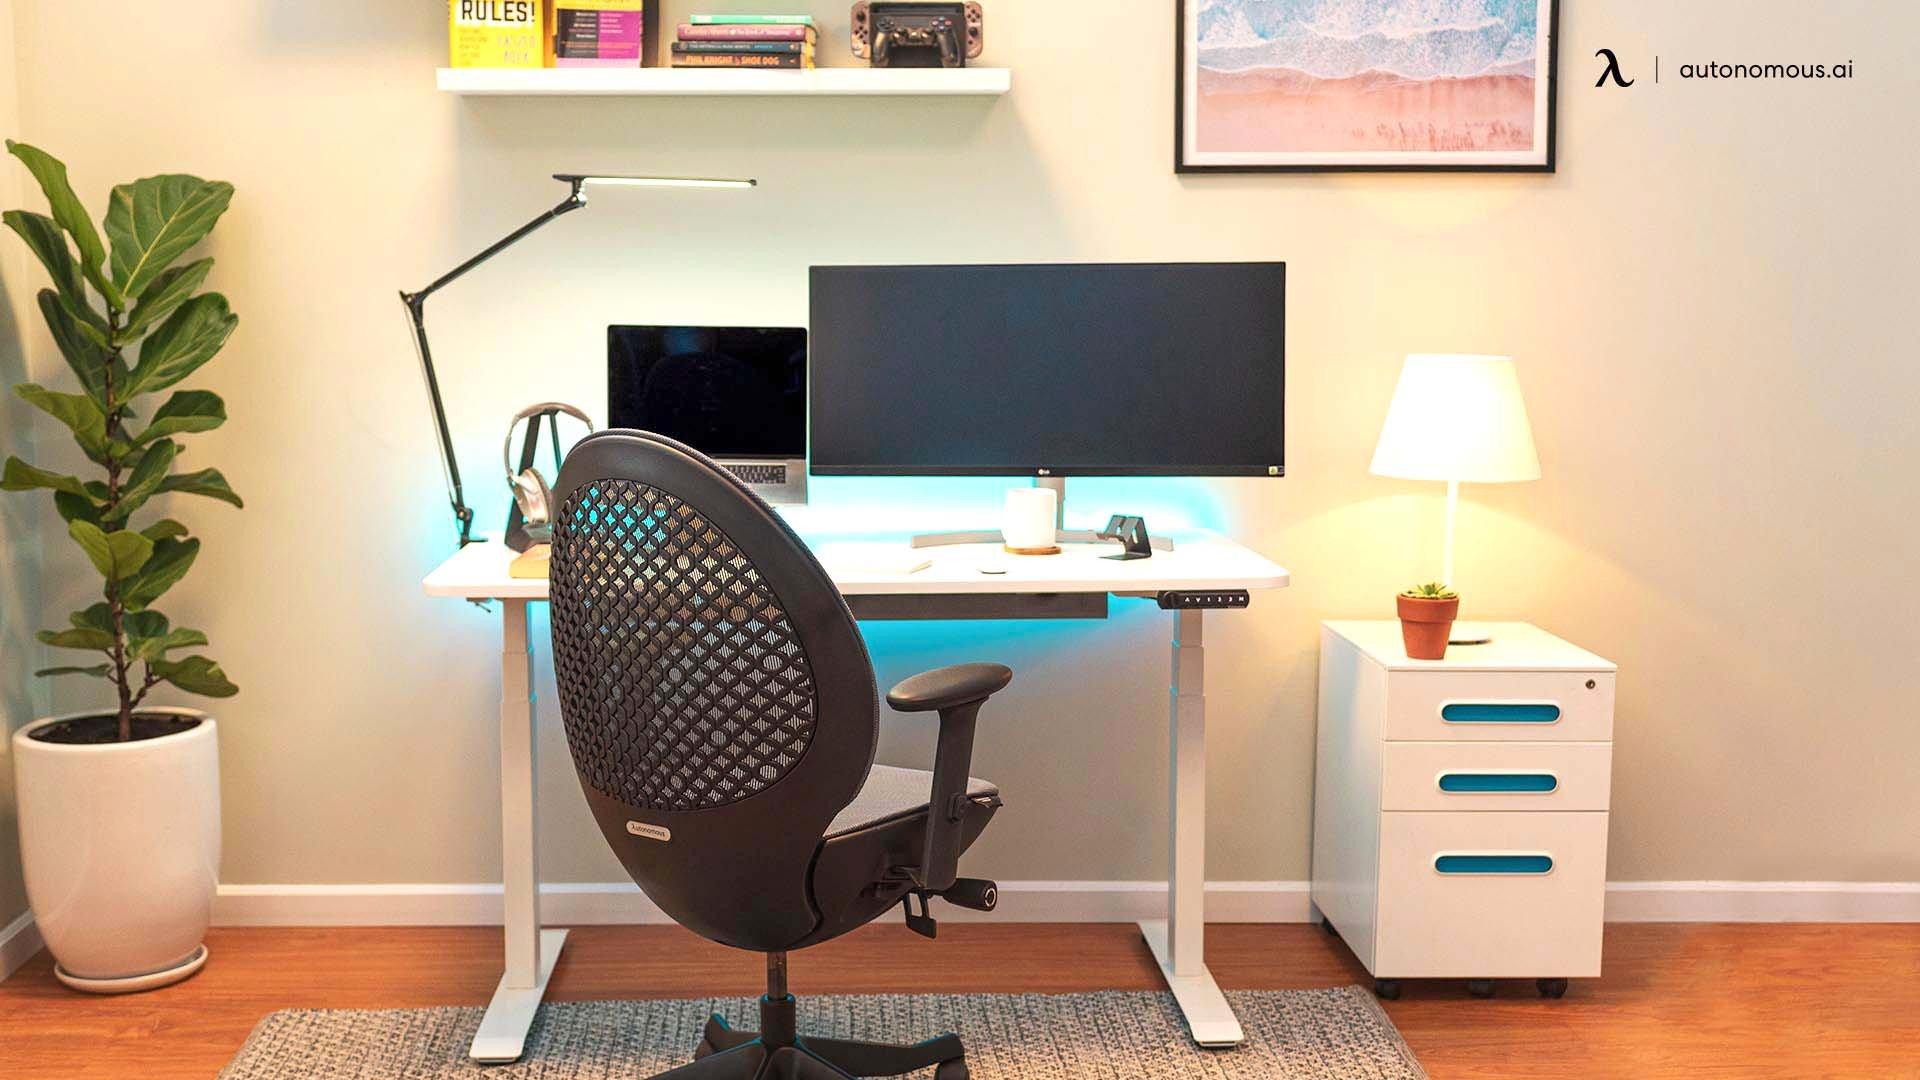 How Do You Find an Ideal Ergonomic Desk Setup?